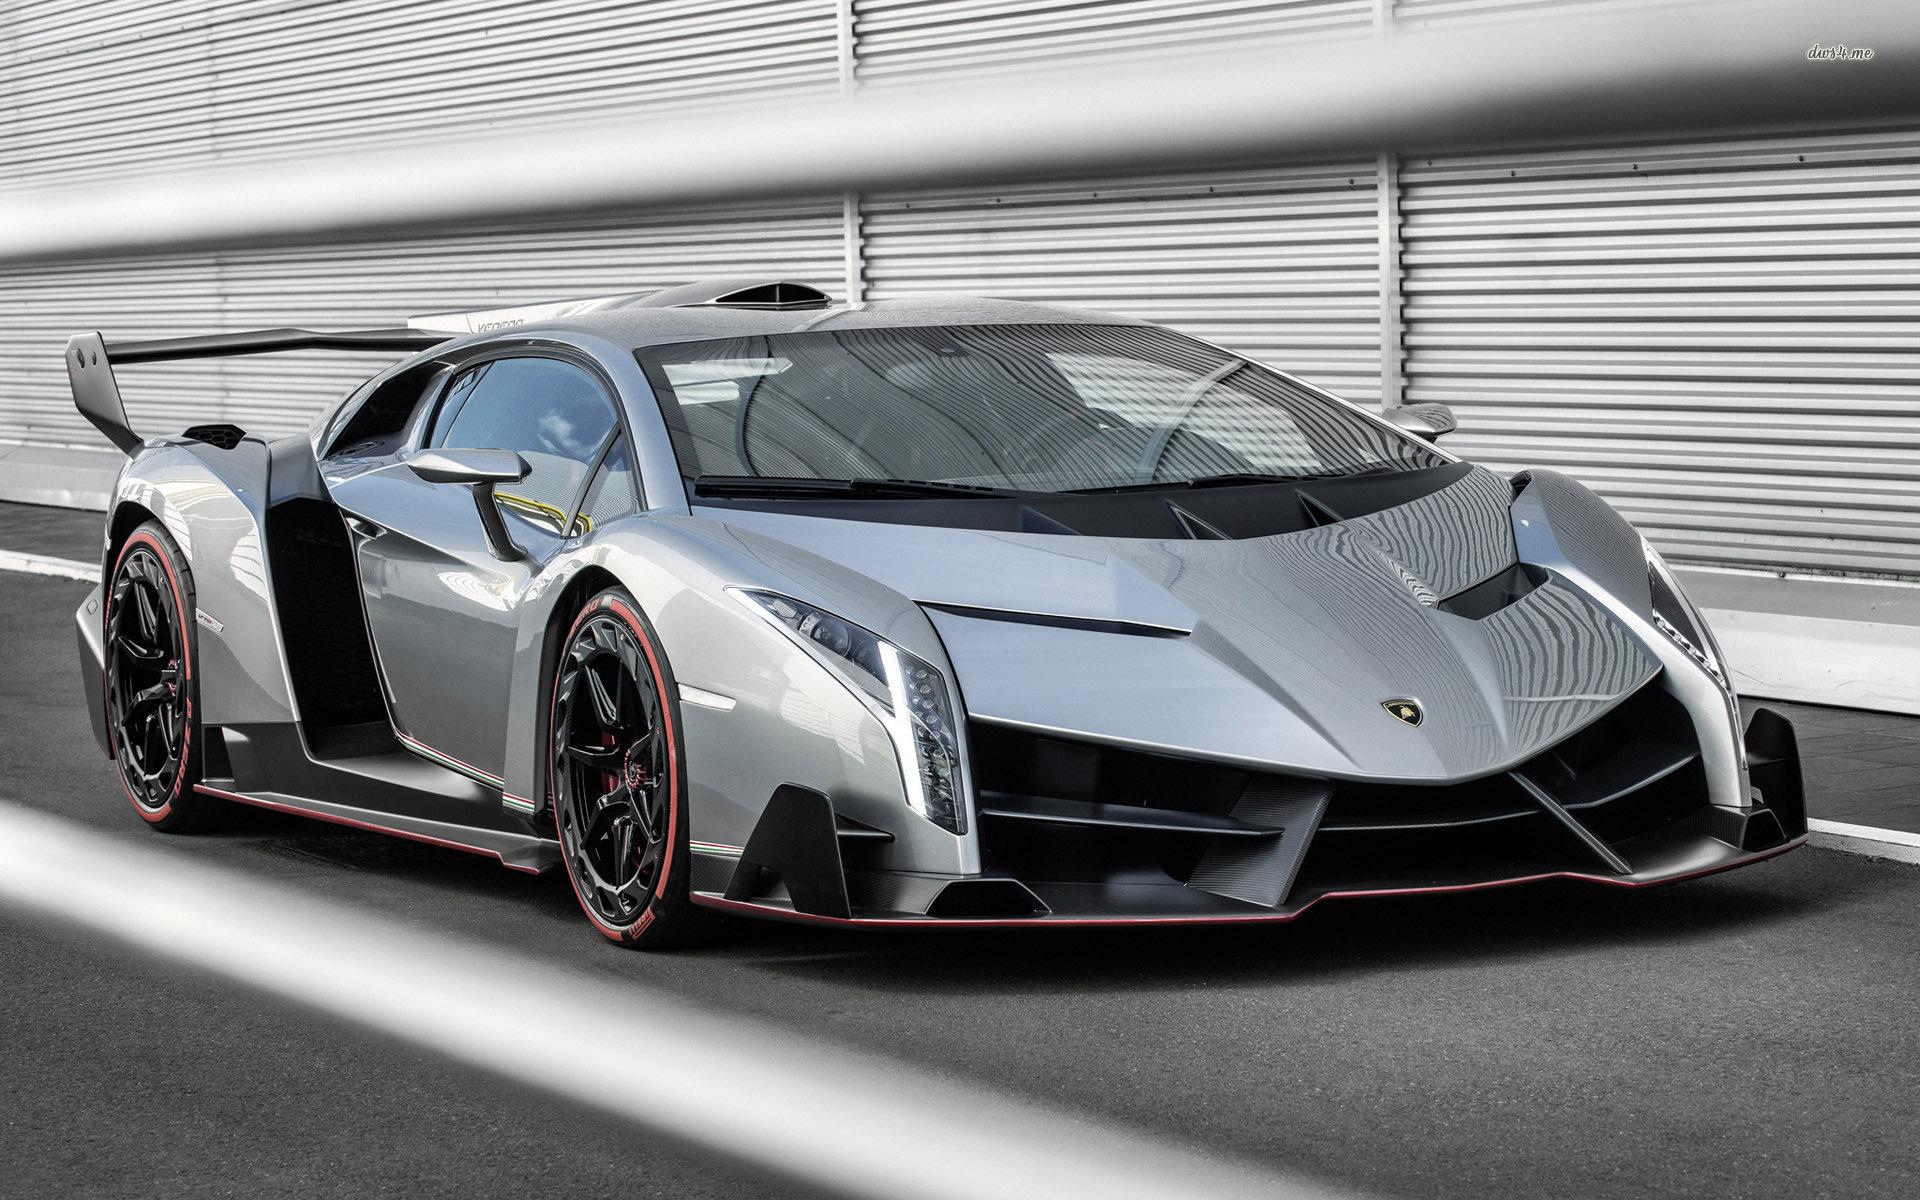 Lamborghini Veneno Wallpapers Hd For Desktop Backgrounds